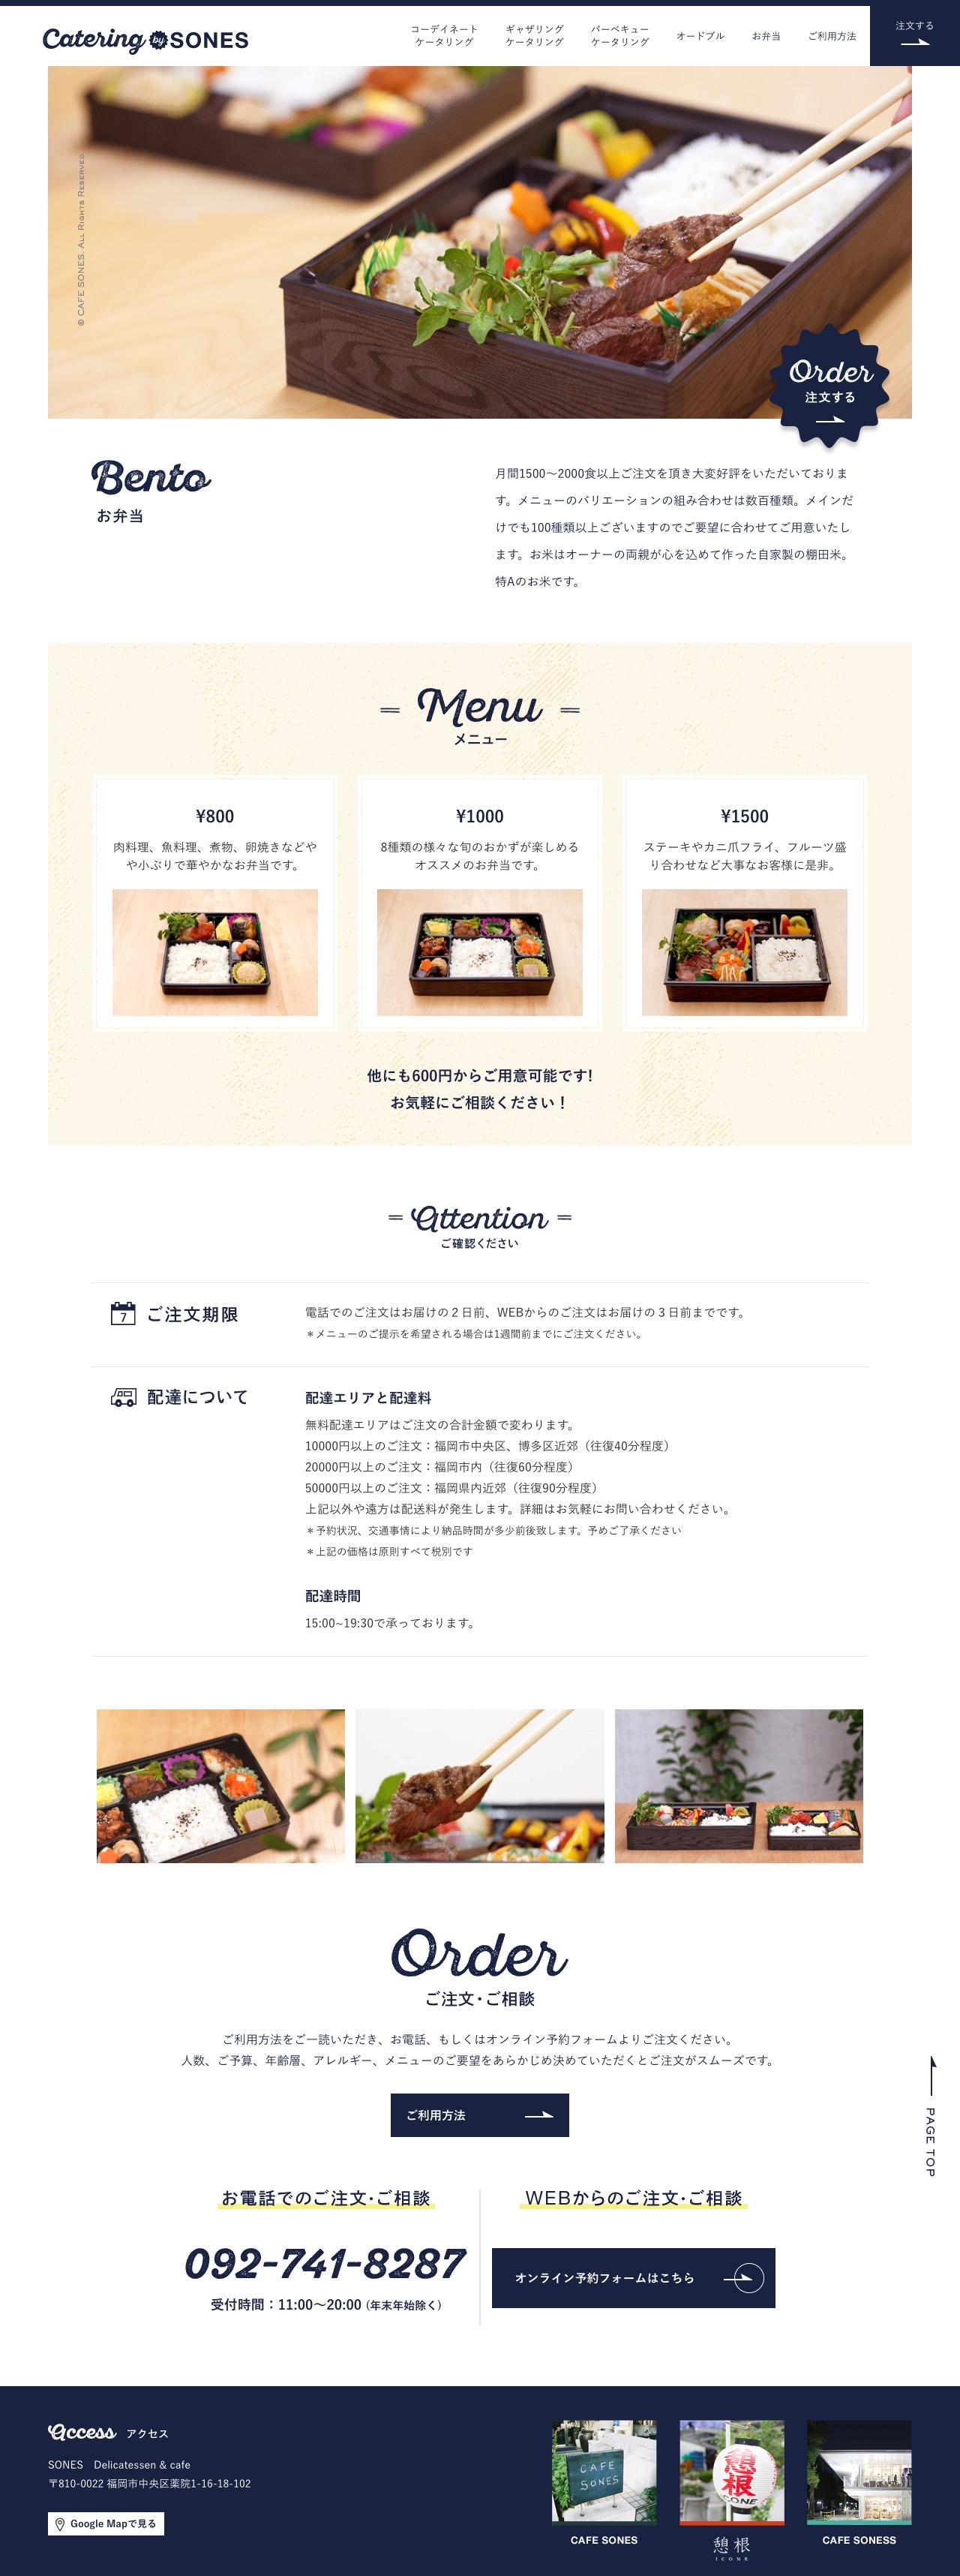 screencapture-sones-cc-catering-bento-2018-05-02-10_50_15